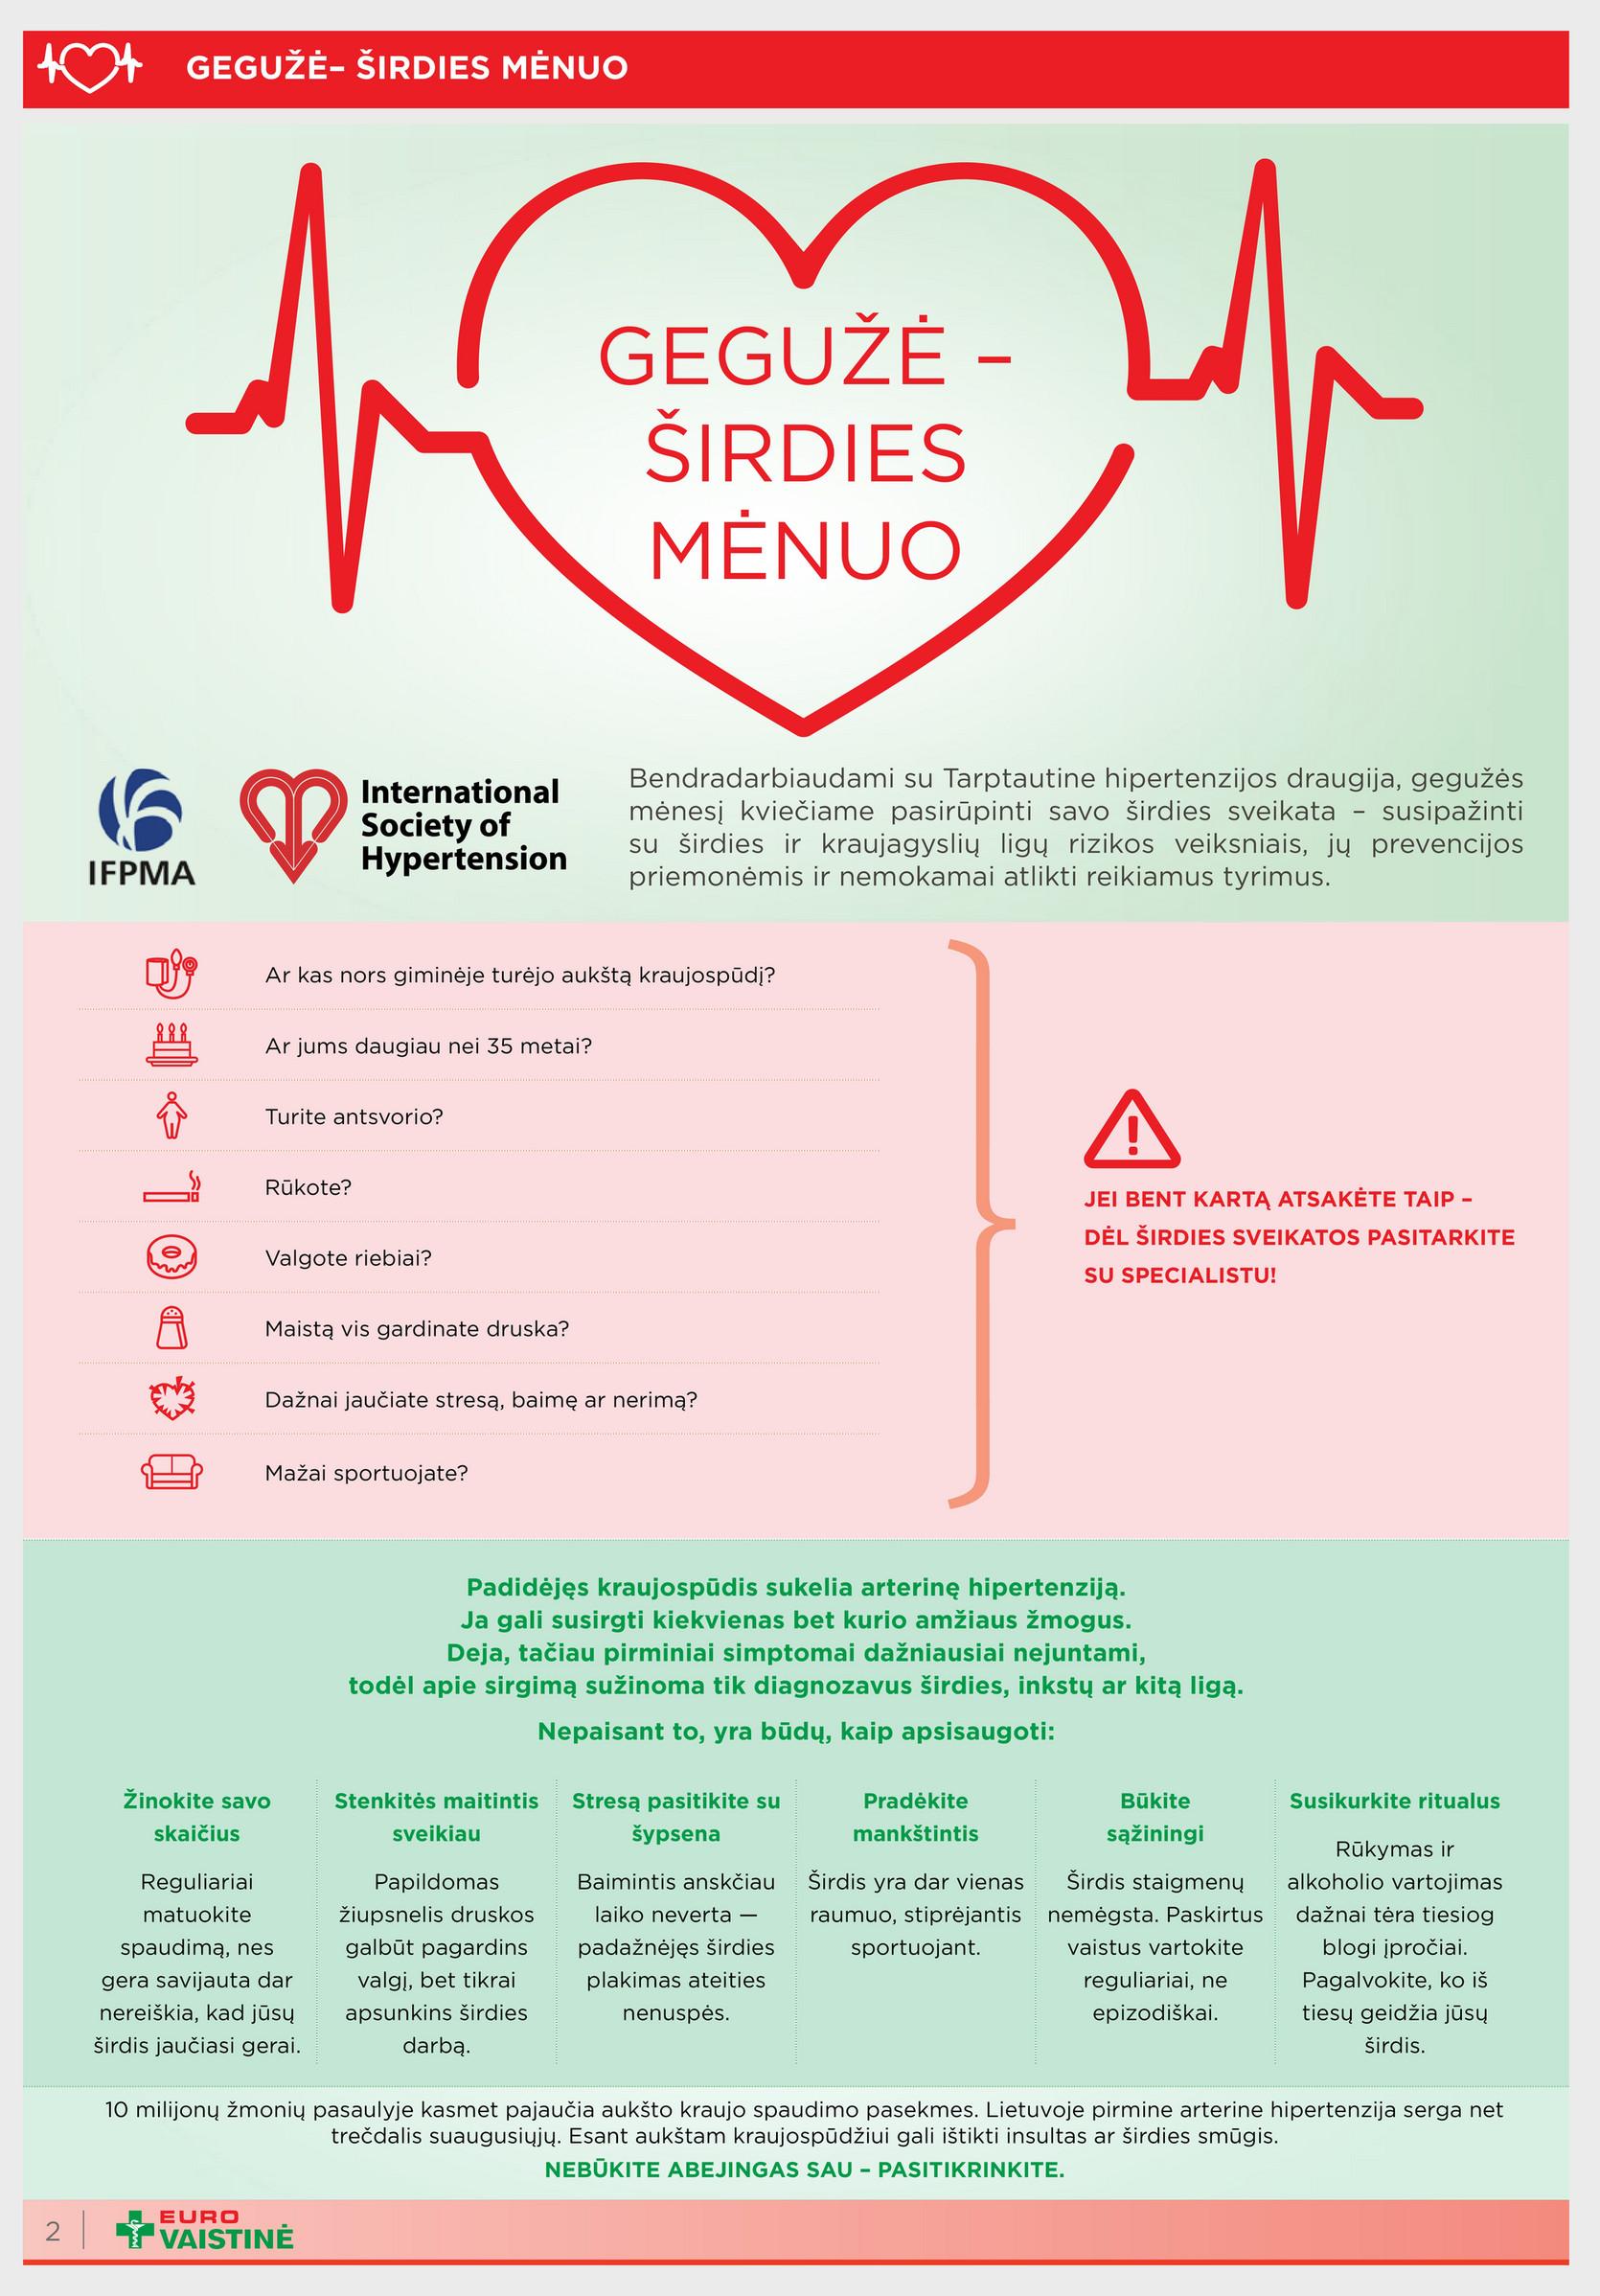 hipertenzija esant 35 priežastims